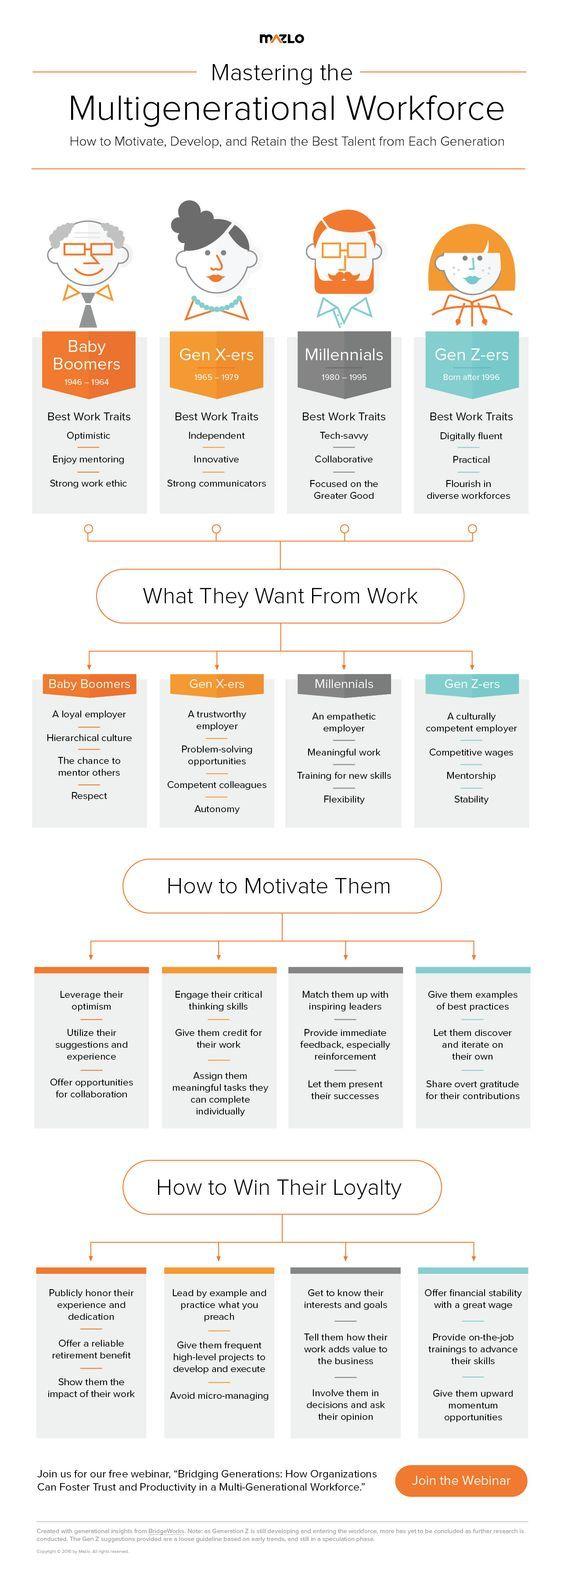 workforce management and development practices